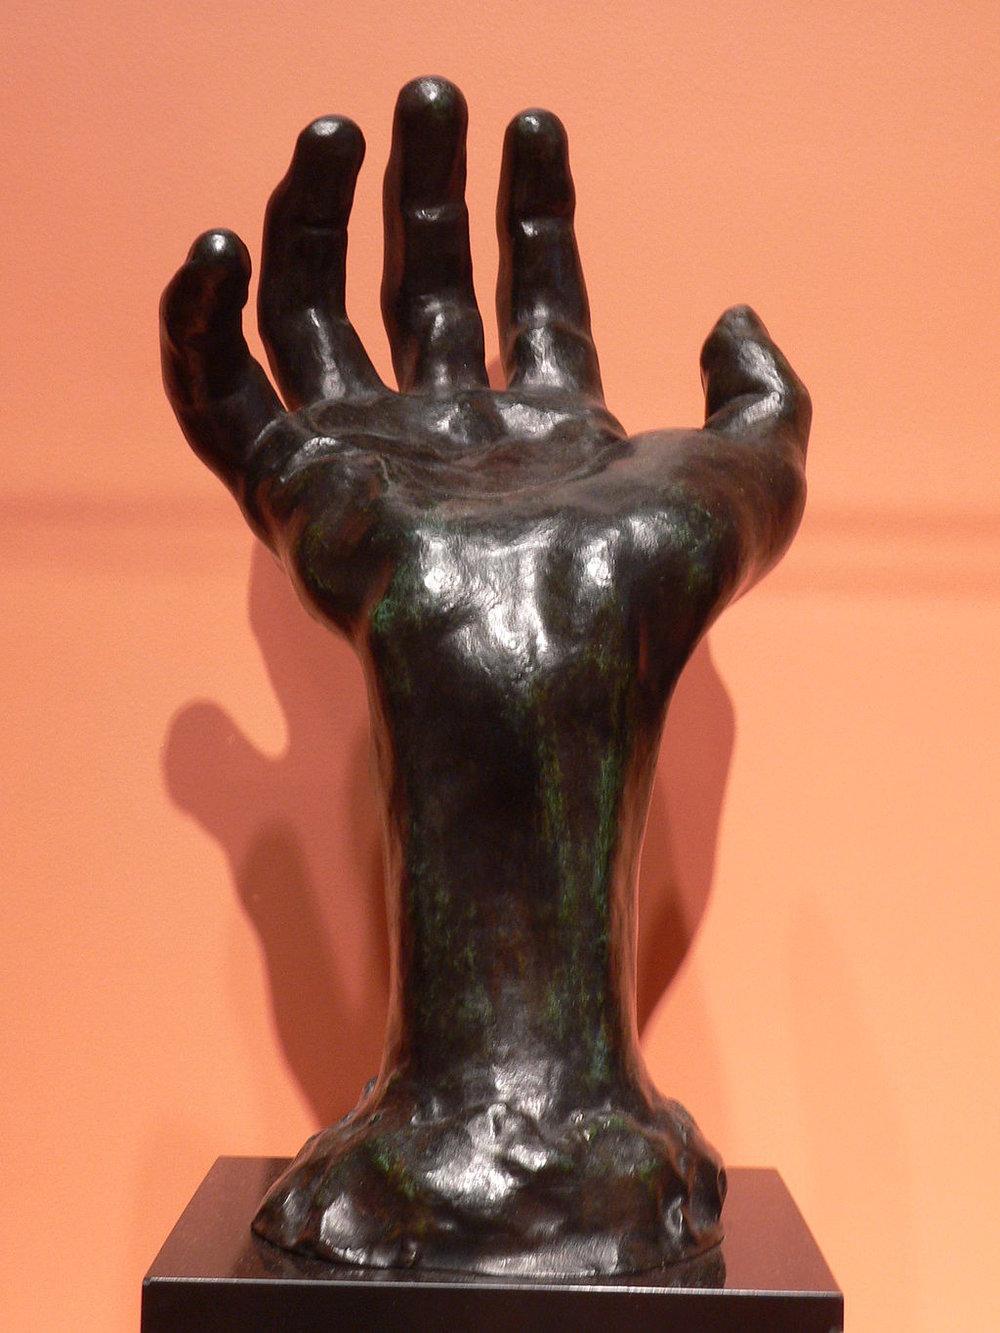 Rodin_right_hand_p1070062.jpg